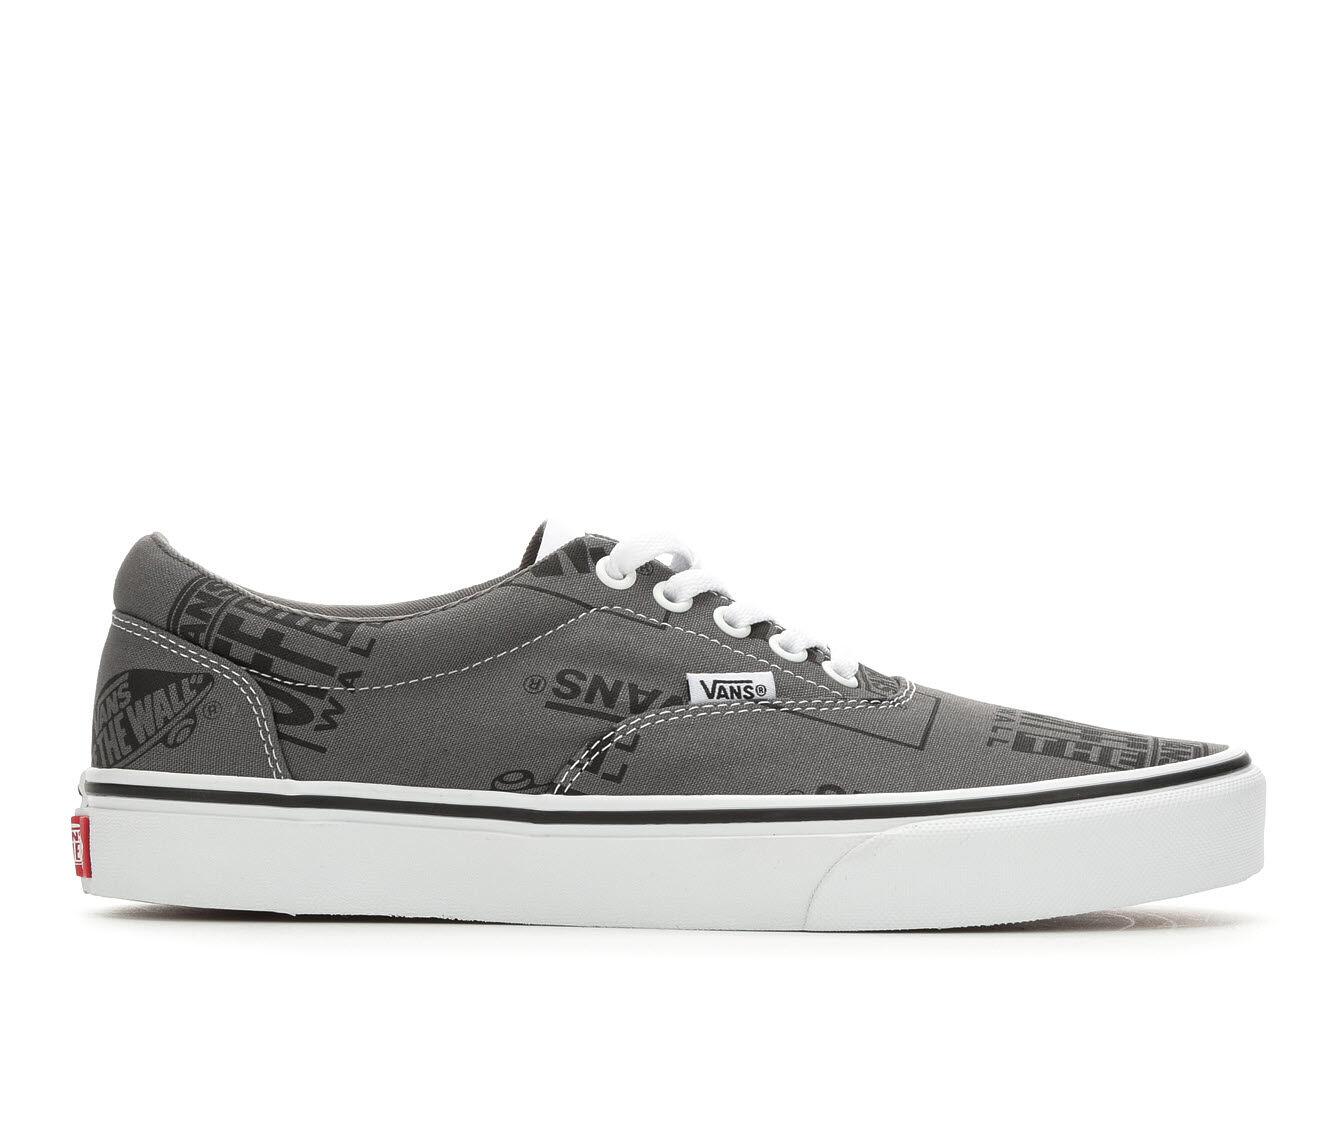 Men's Vans Doheny Skate Shoes Gy/Bk/Wh Logo